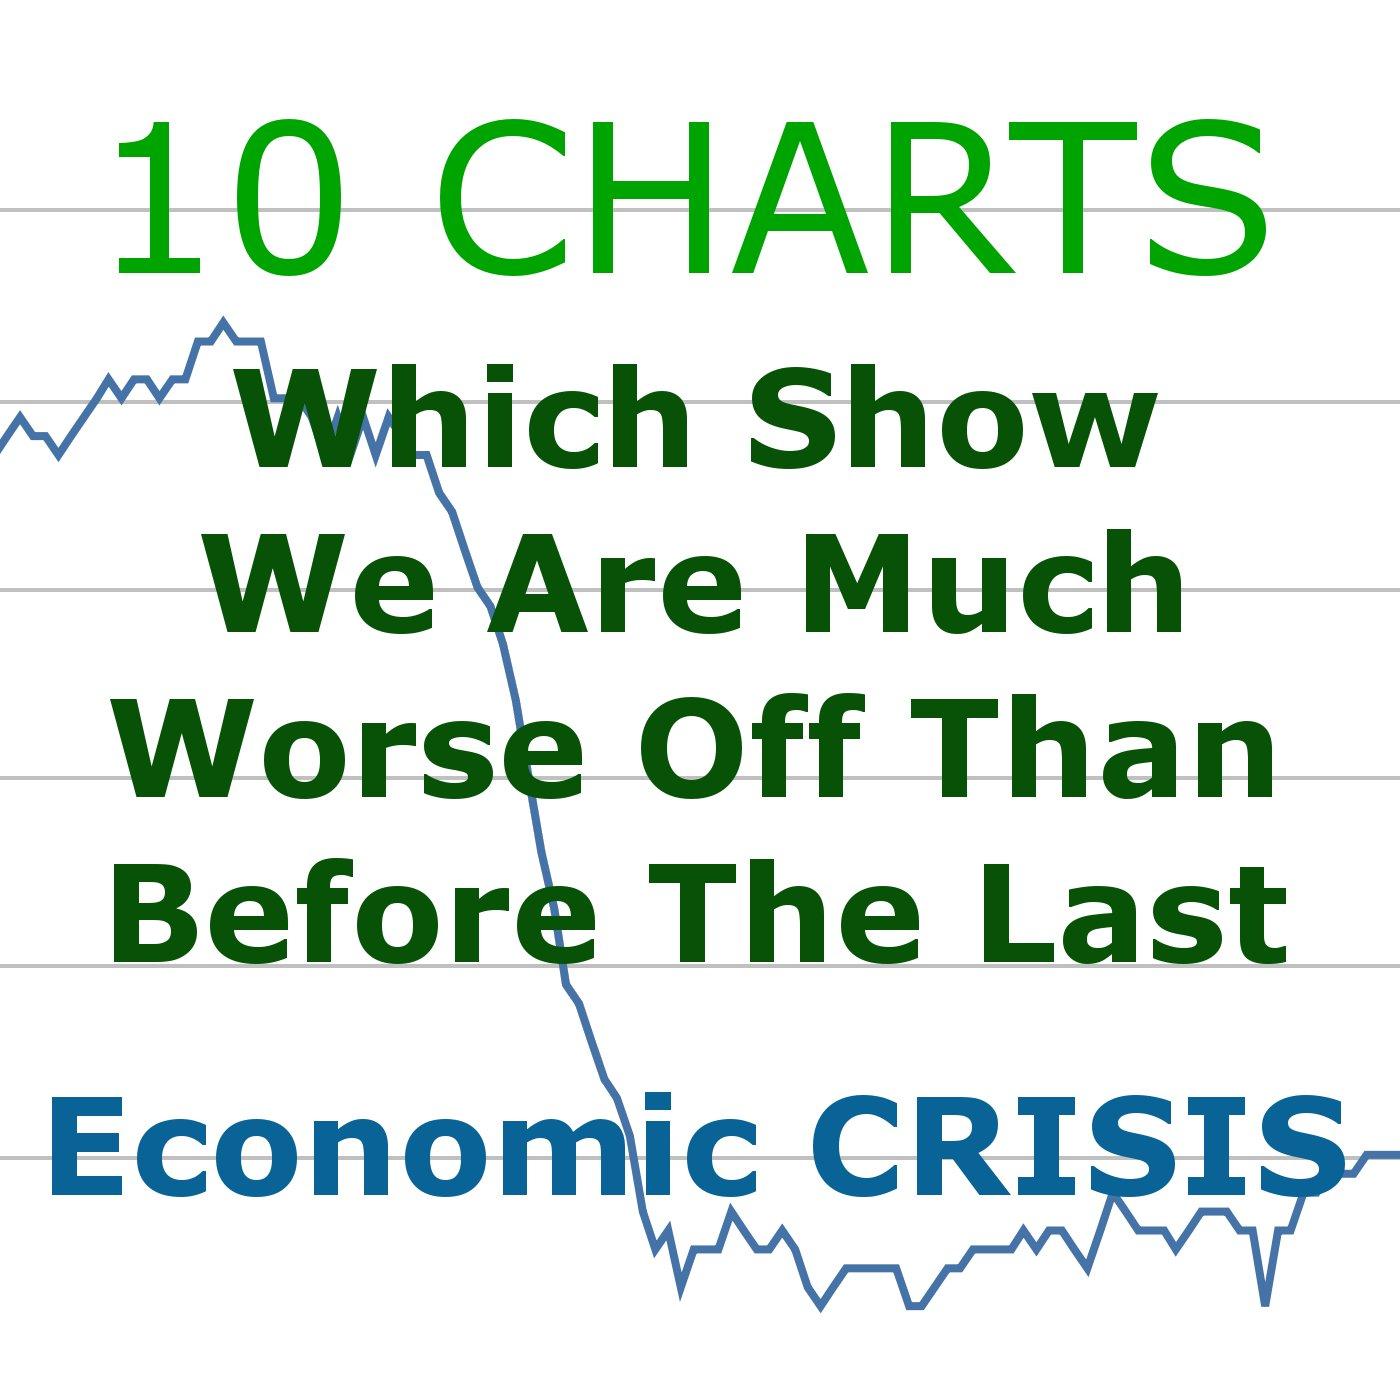 http://theeconomiccollapseblog.com/wp-content/uploads/2015/03/10-Charts-Economic-Crisis.jpg